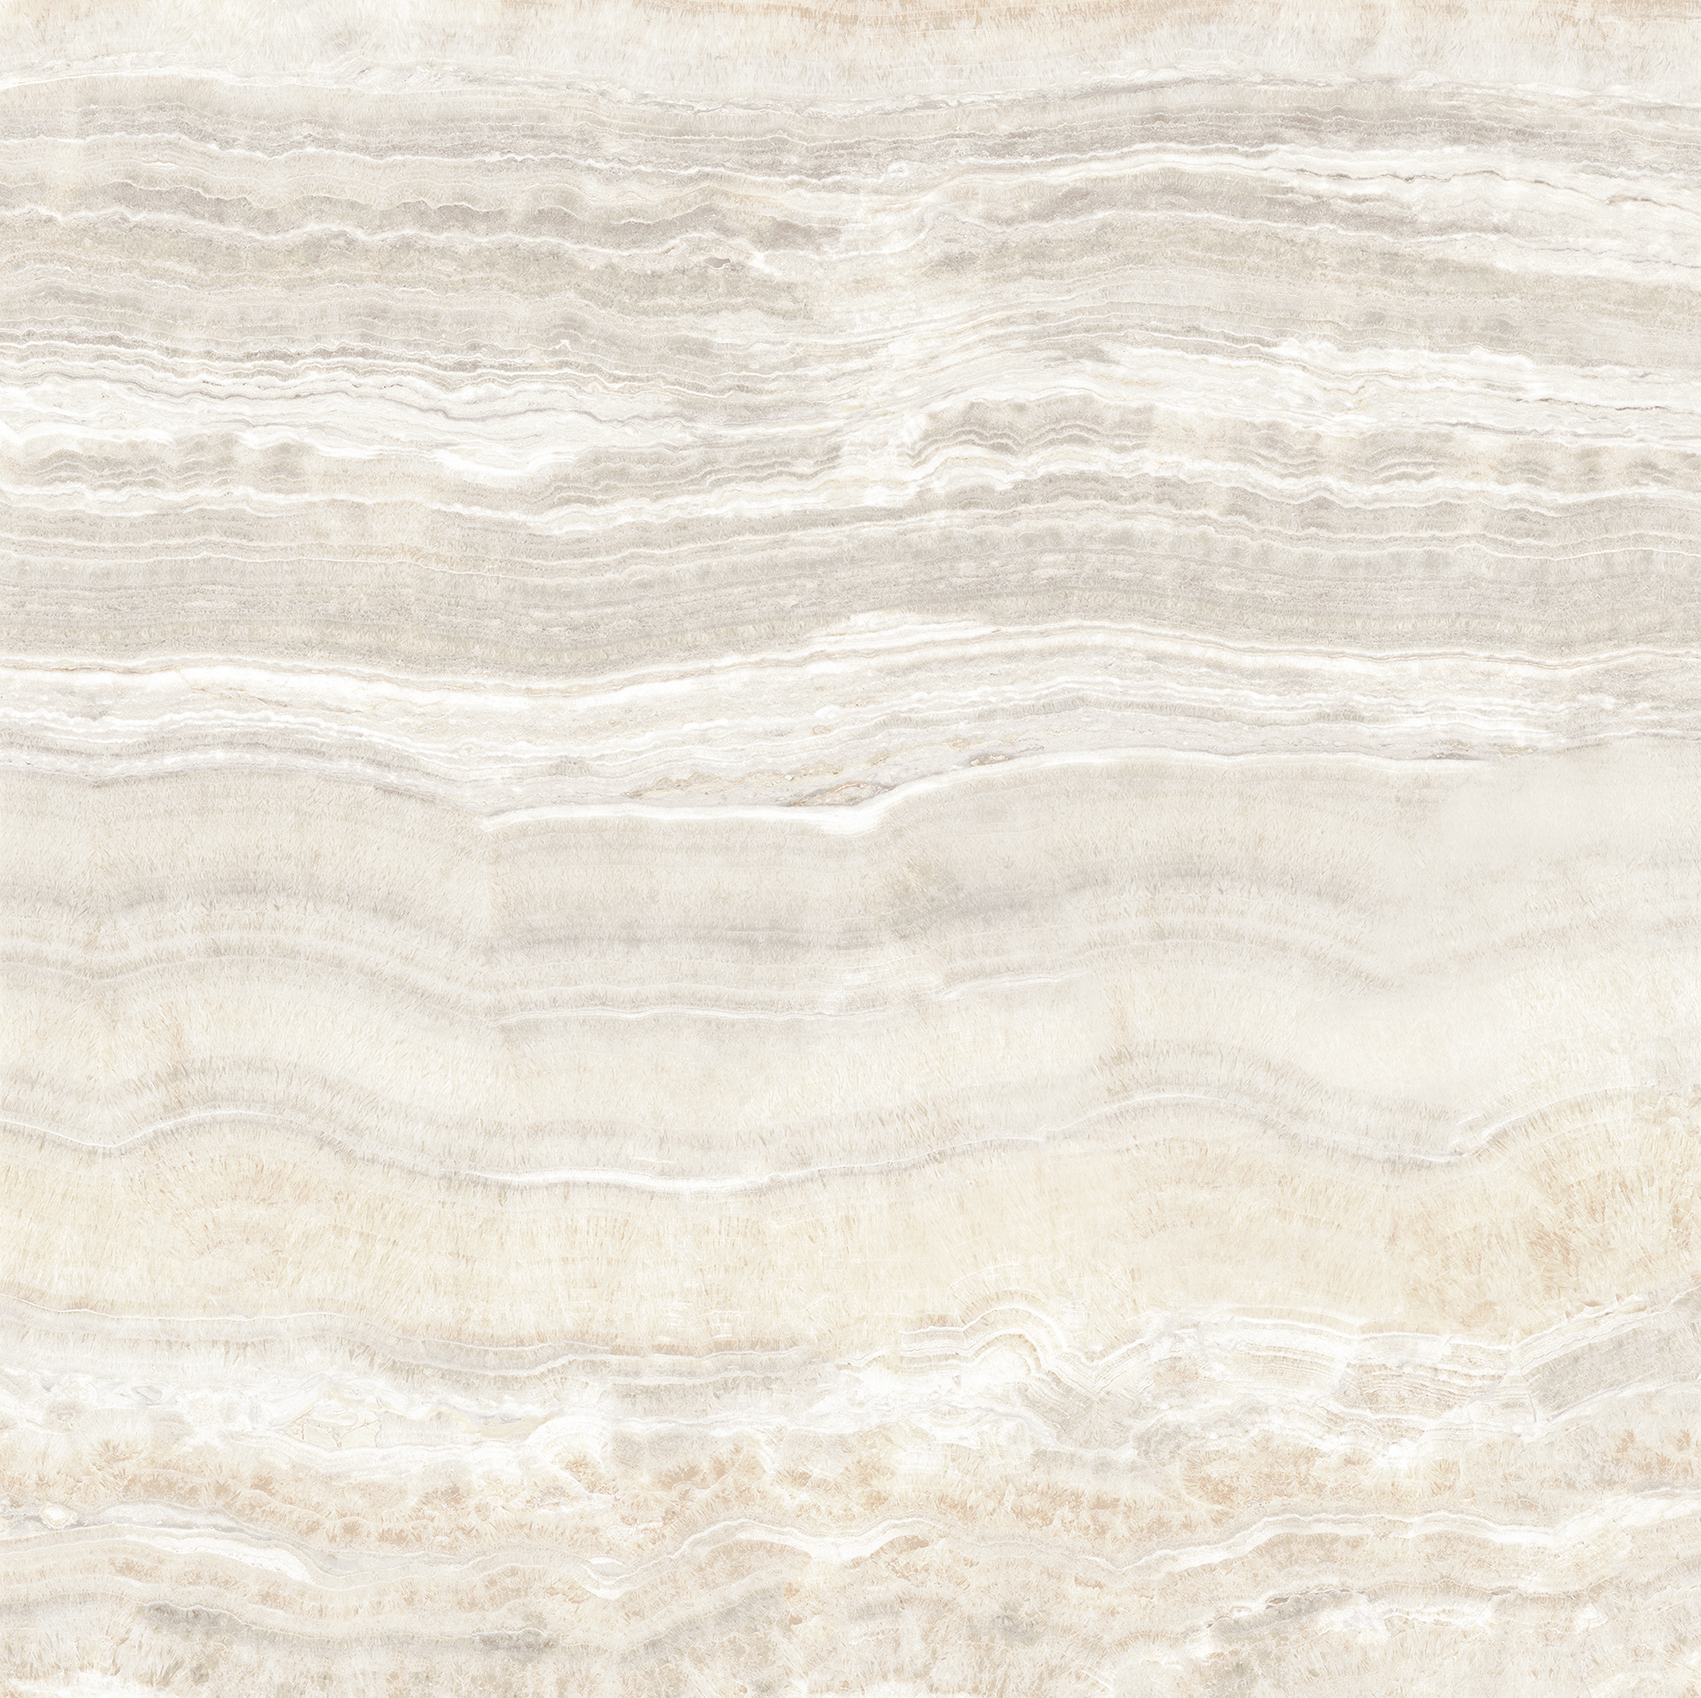 Onyx of Cerim Sand Matte 10mm 60 x 60